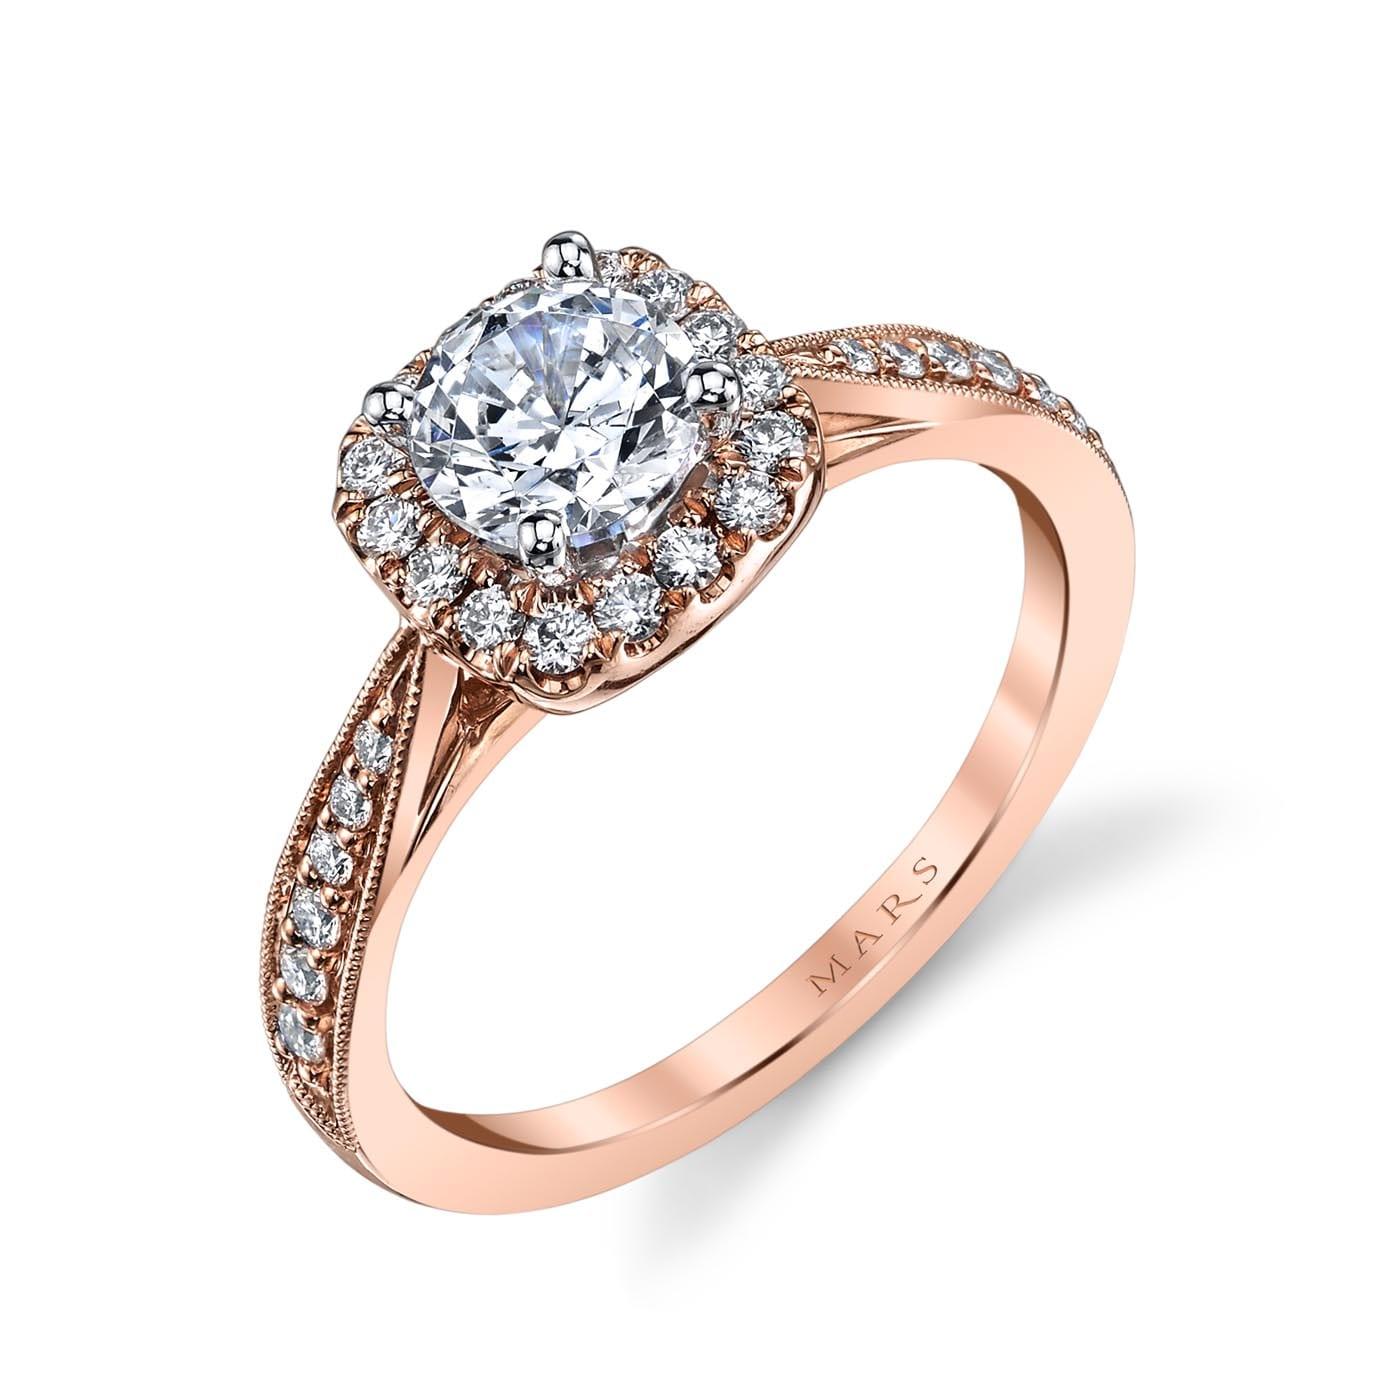 Halo Engagement RingStyle #: MARS 25804